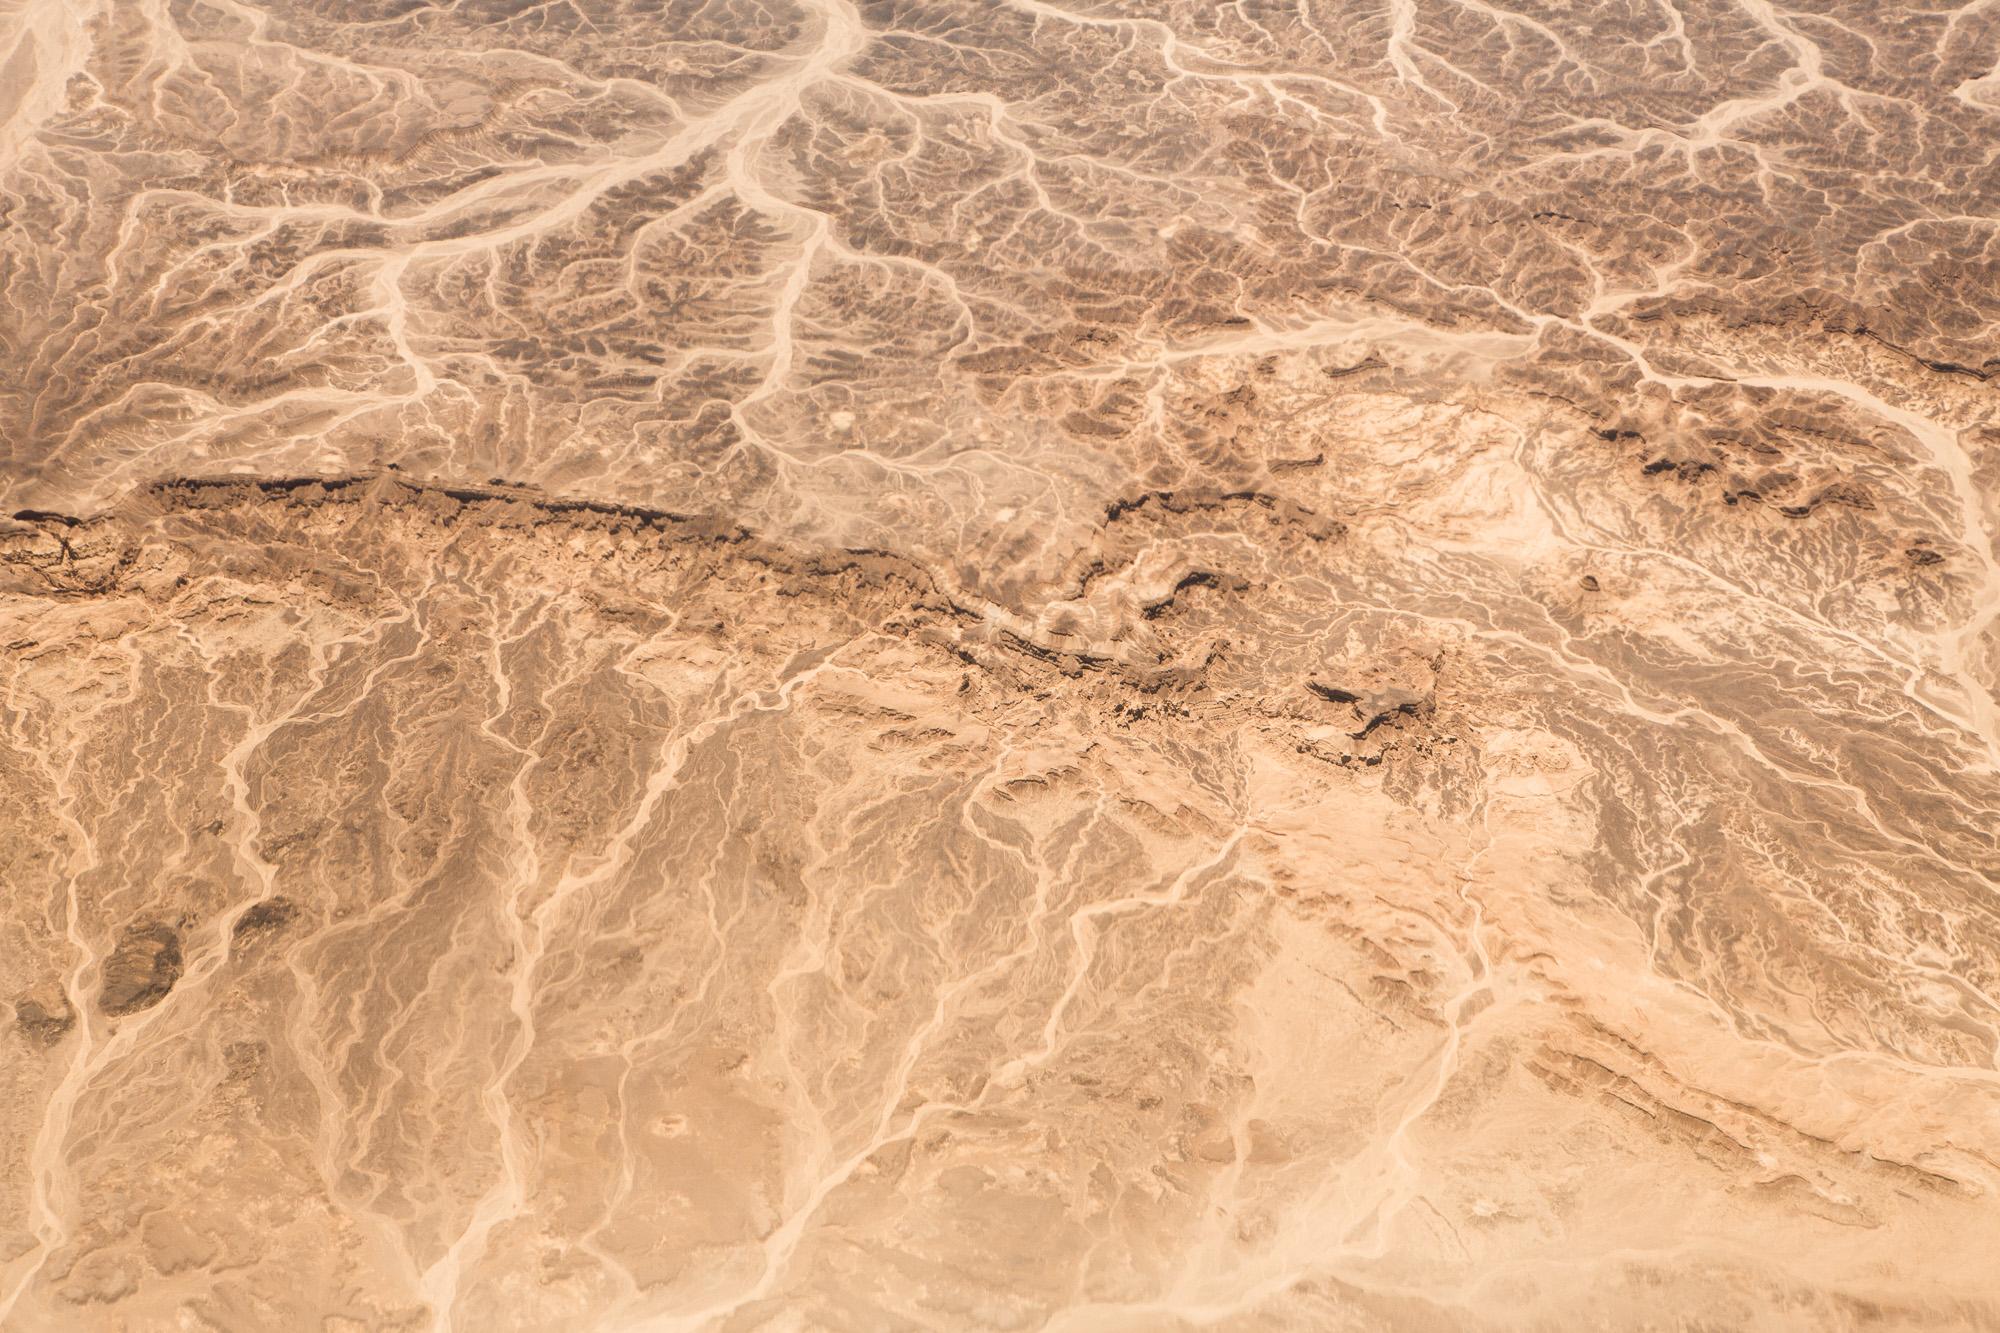 Deserts - Survey #2, 2015